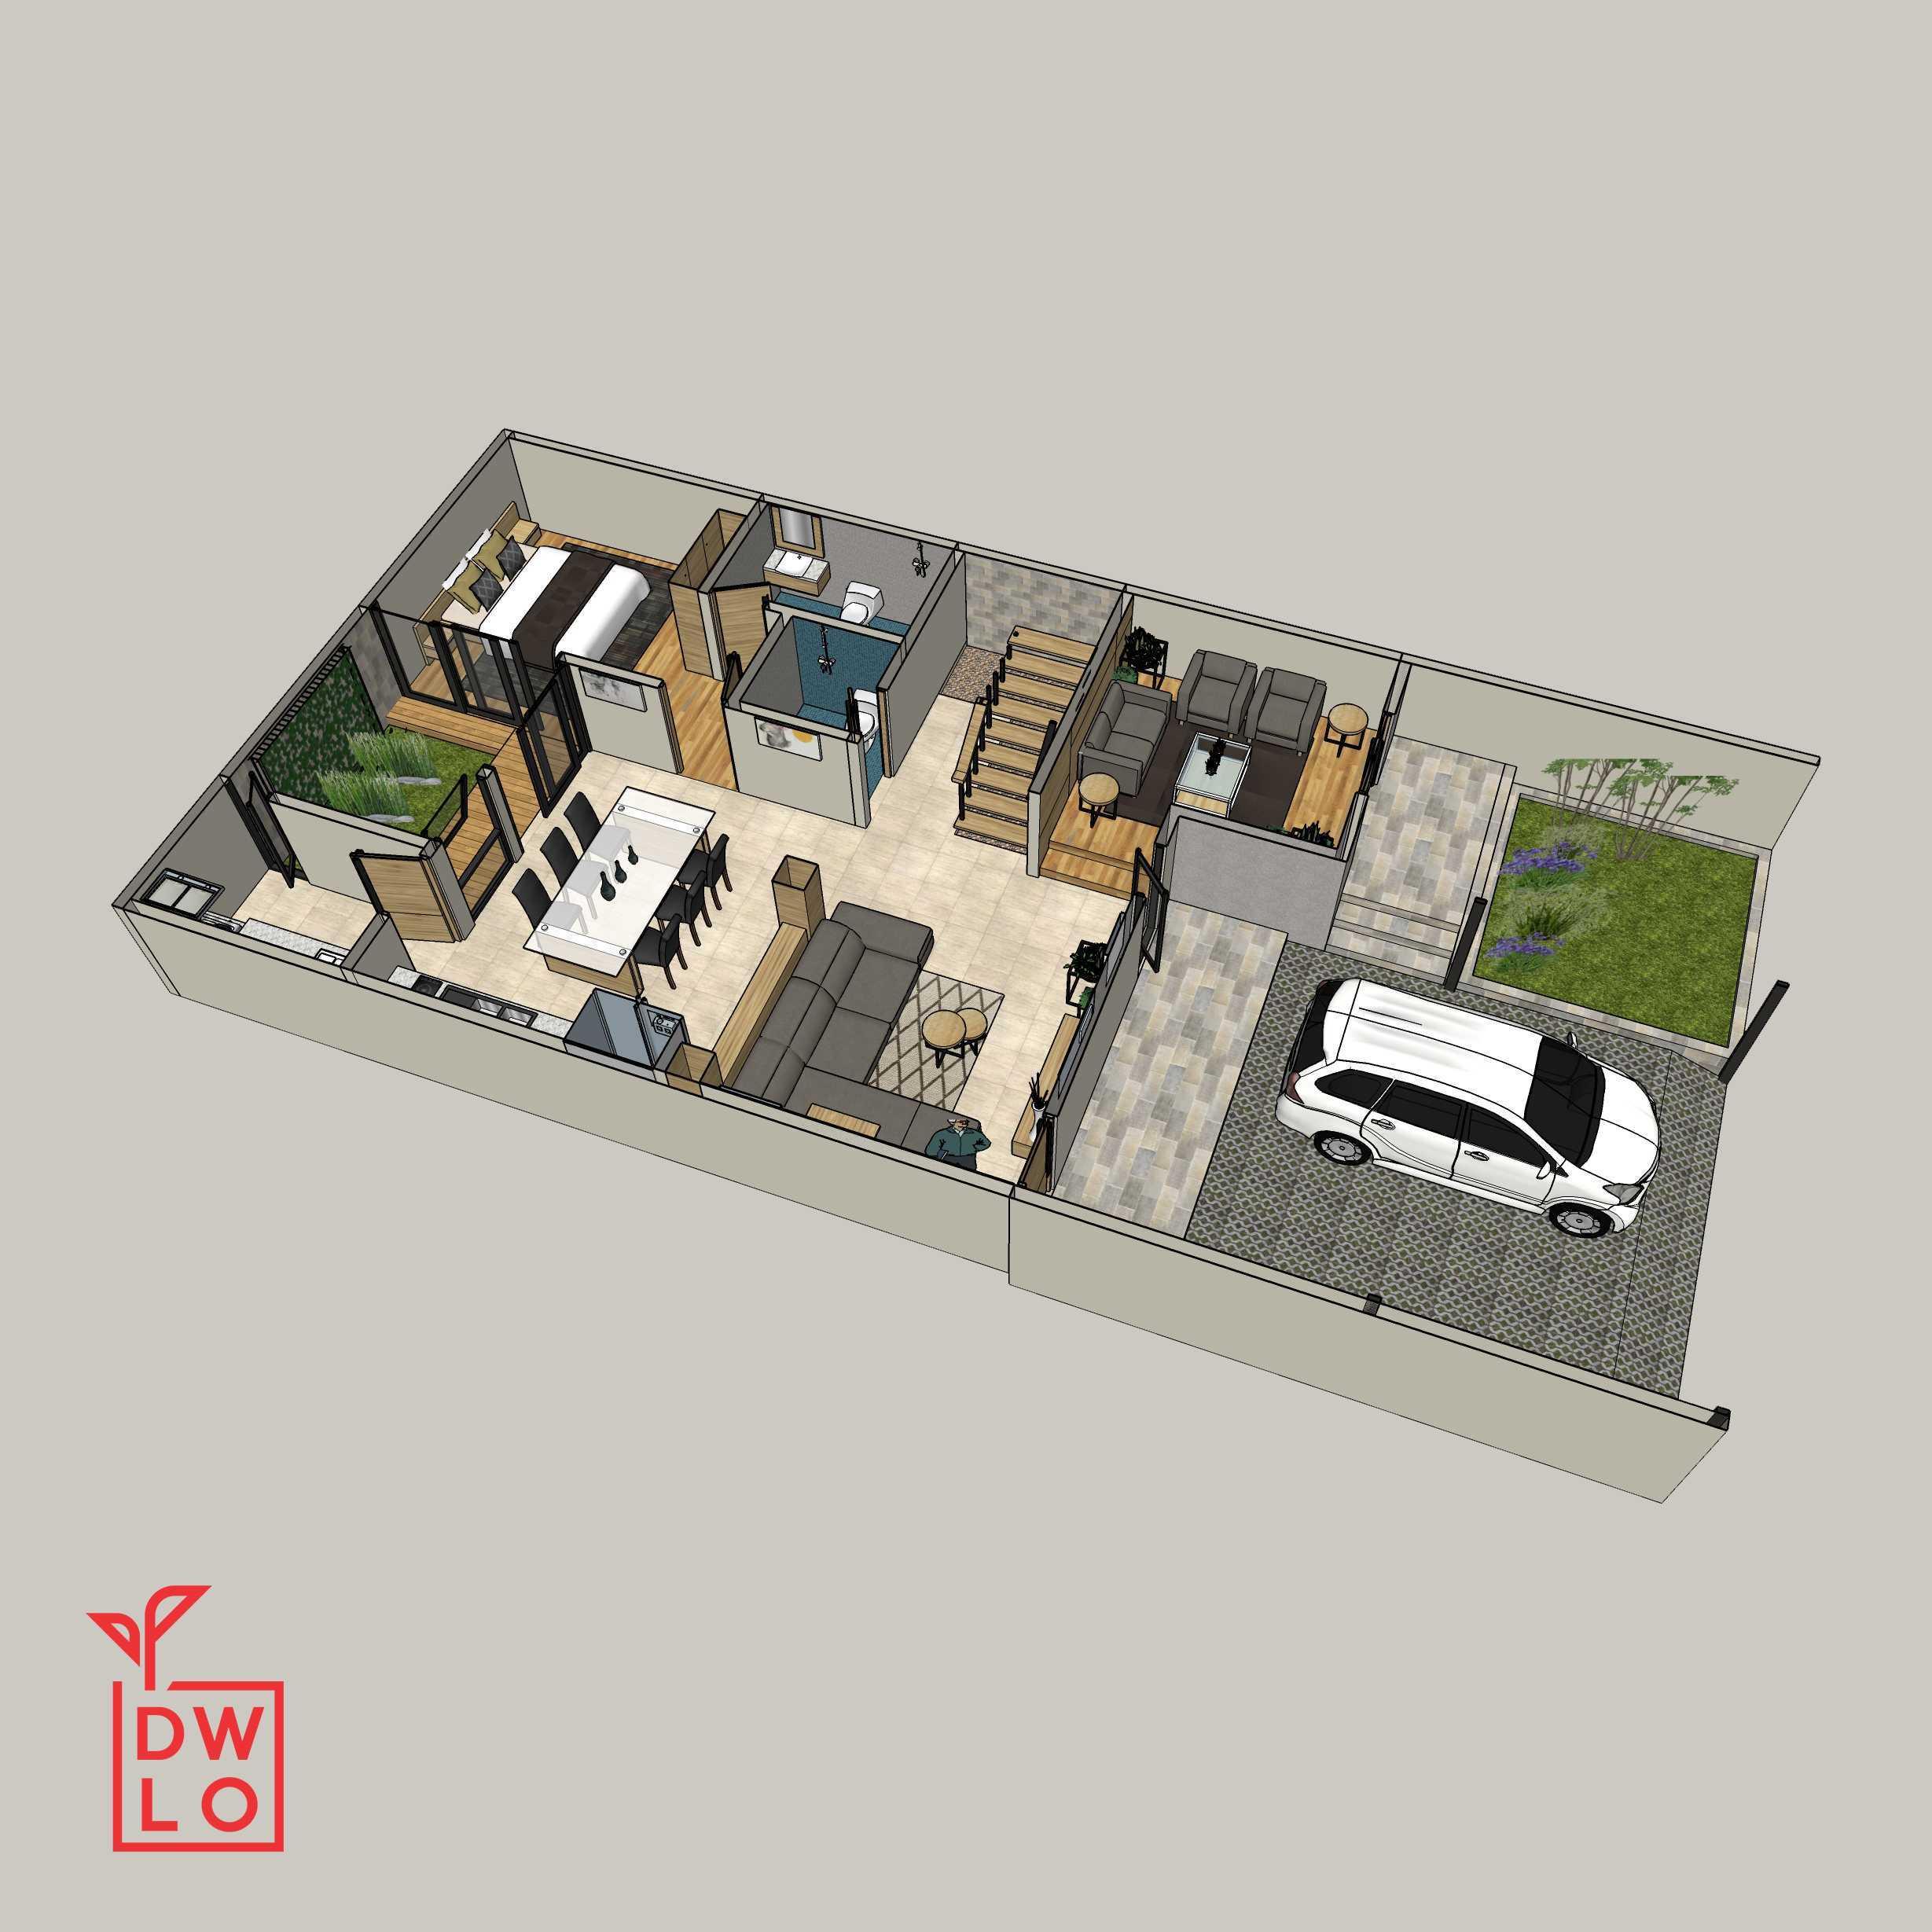 Danu Ega Amin Residence Pekanbaru, Kota Pekanbaru, Riau, Indonesia Pekanbaru, Kota Pekanbaru, Riau, Indonesia Floorplan Contemporary  45432